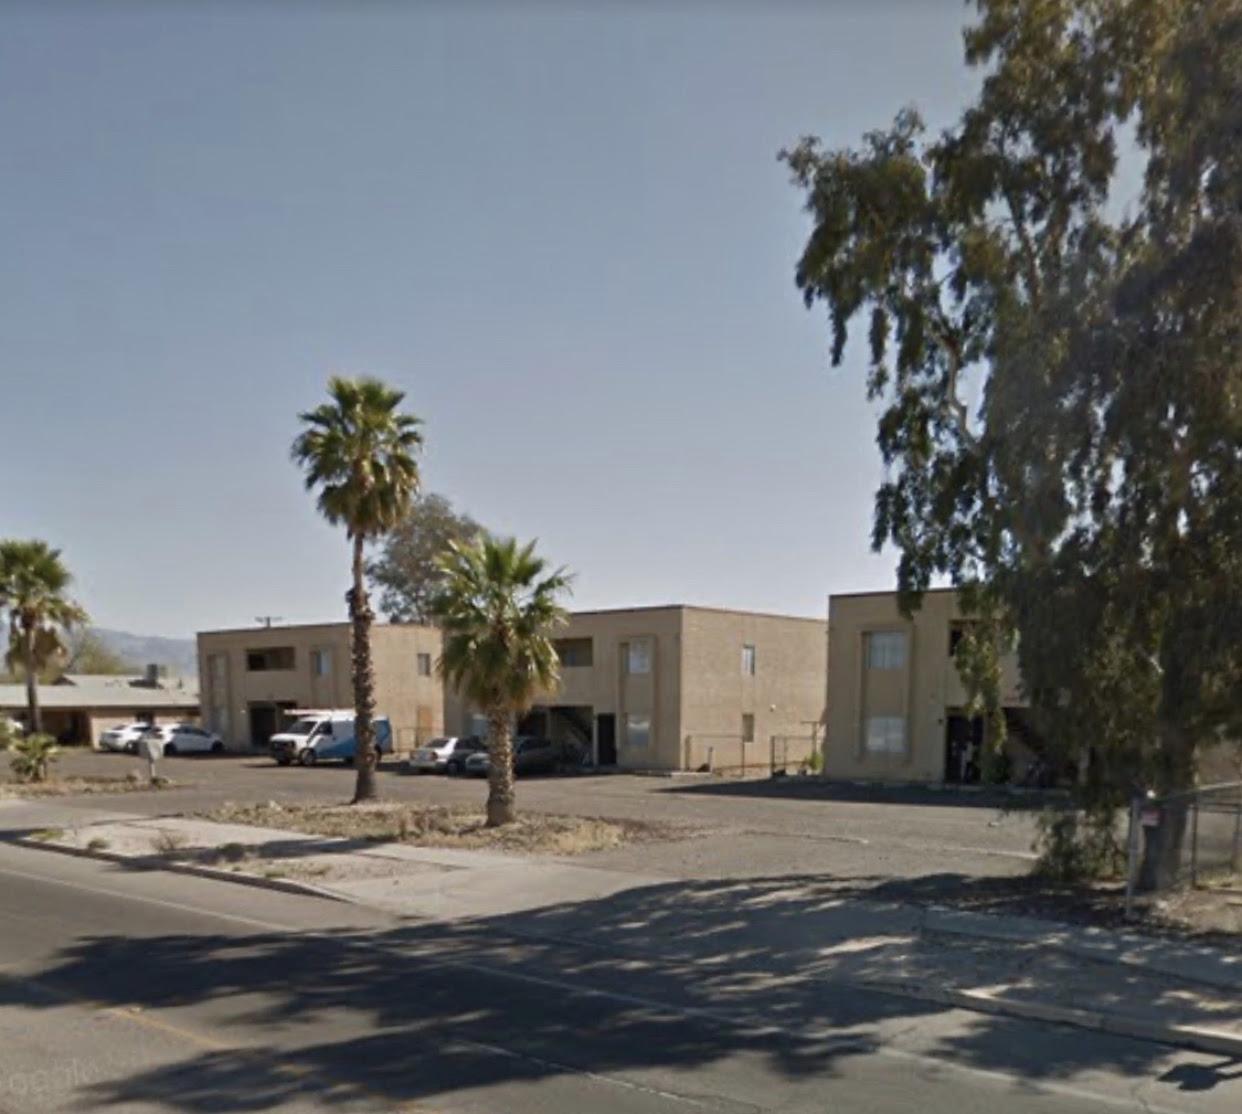 4957 S Park Ave , 4959 S Park Ave , 4961 S Park Ave, Tucson, AZ 85706 wholesale bundle deal